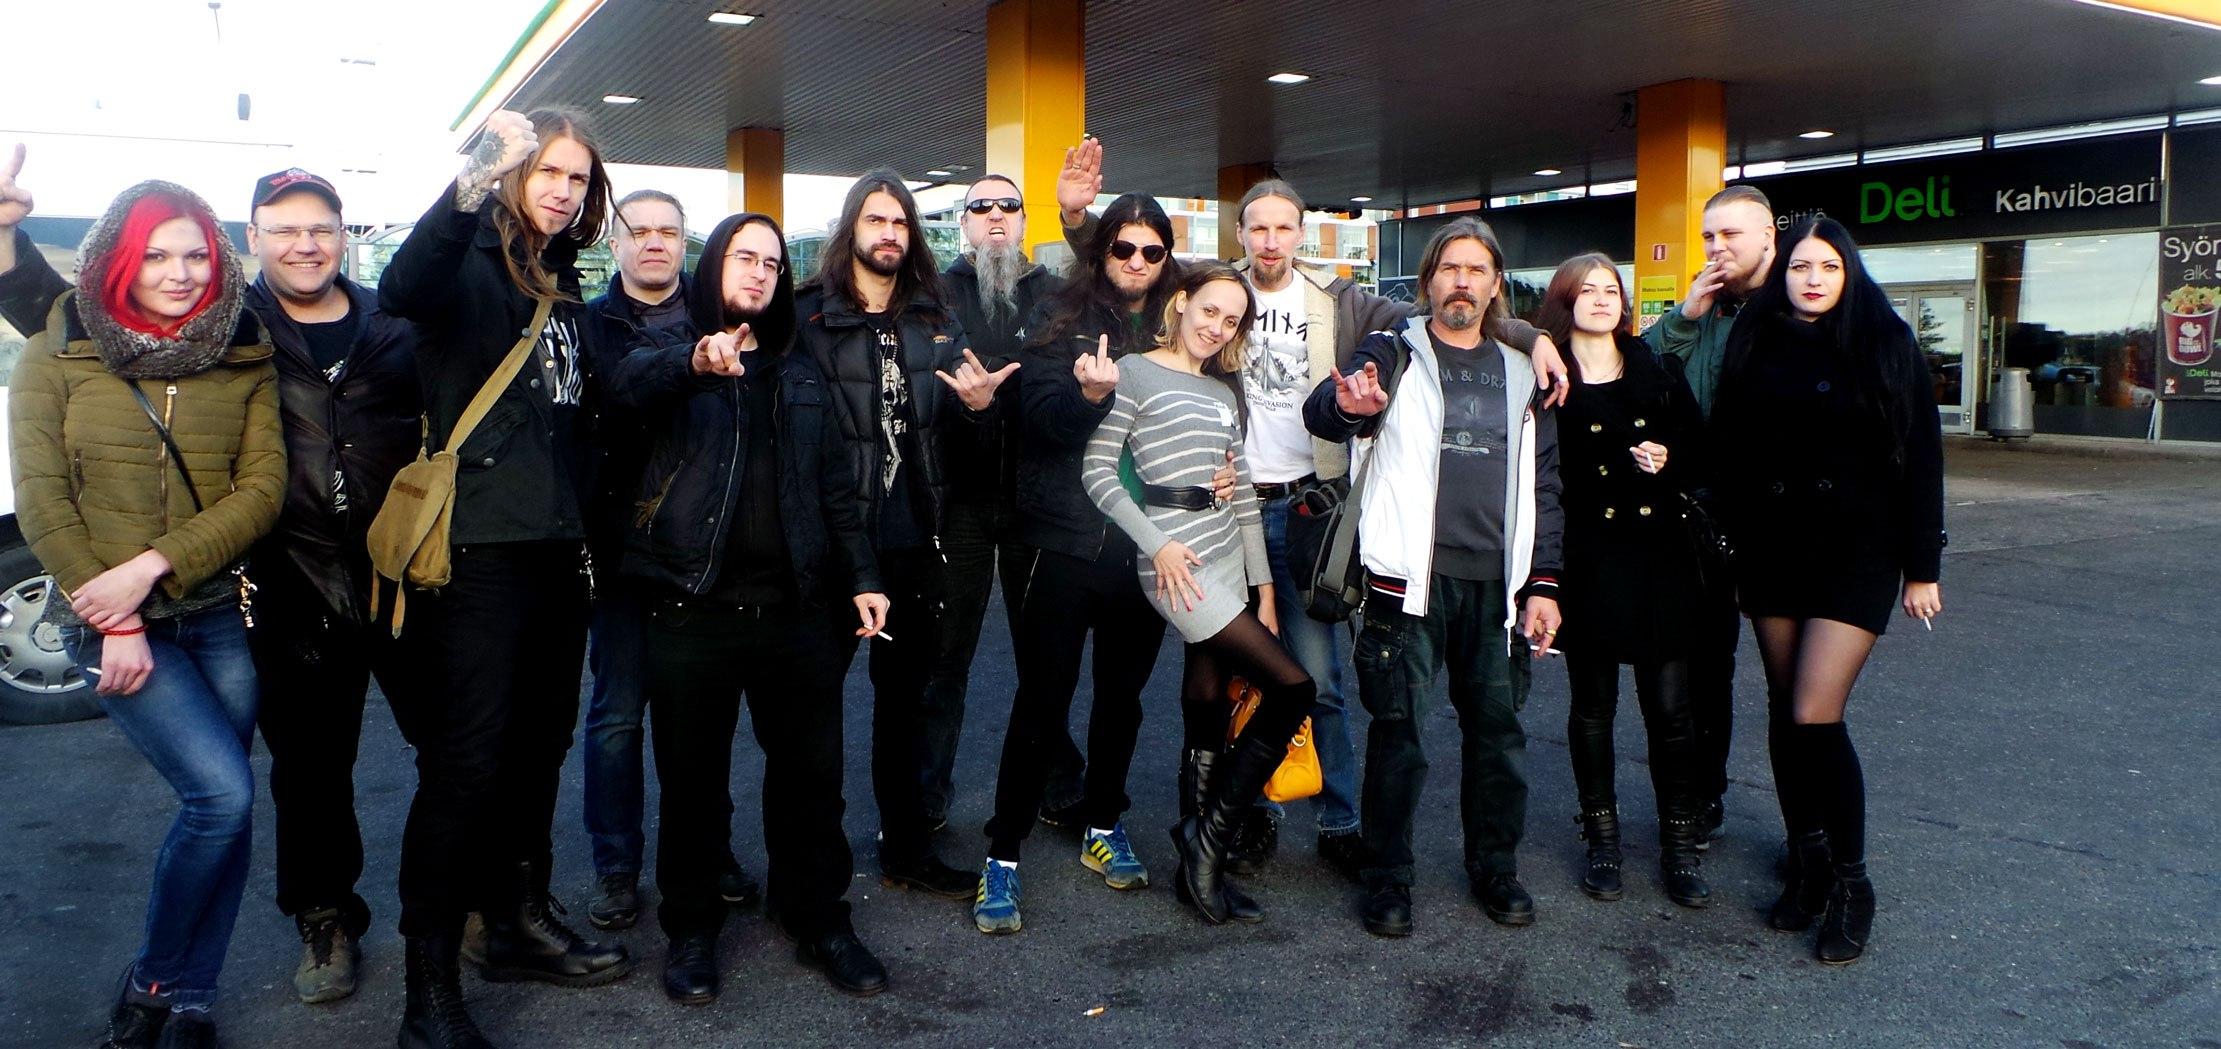 Коррозия Металла в Хельсинки 16 октября 2015